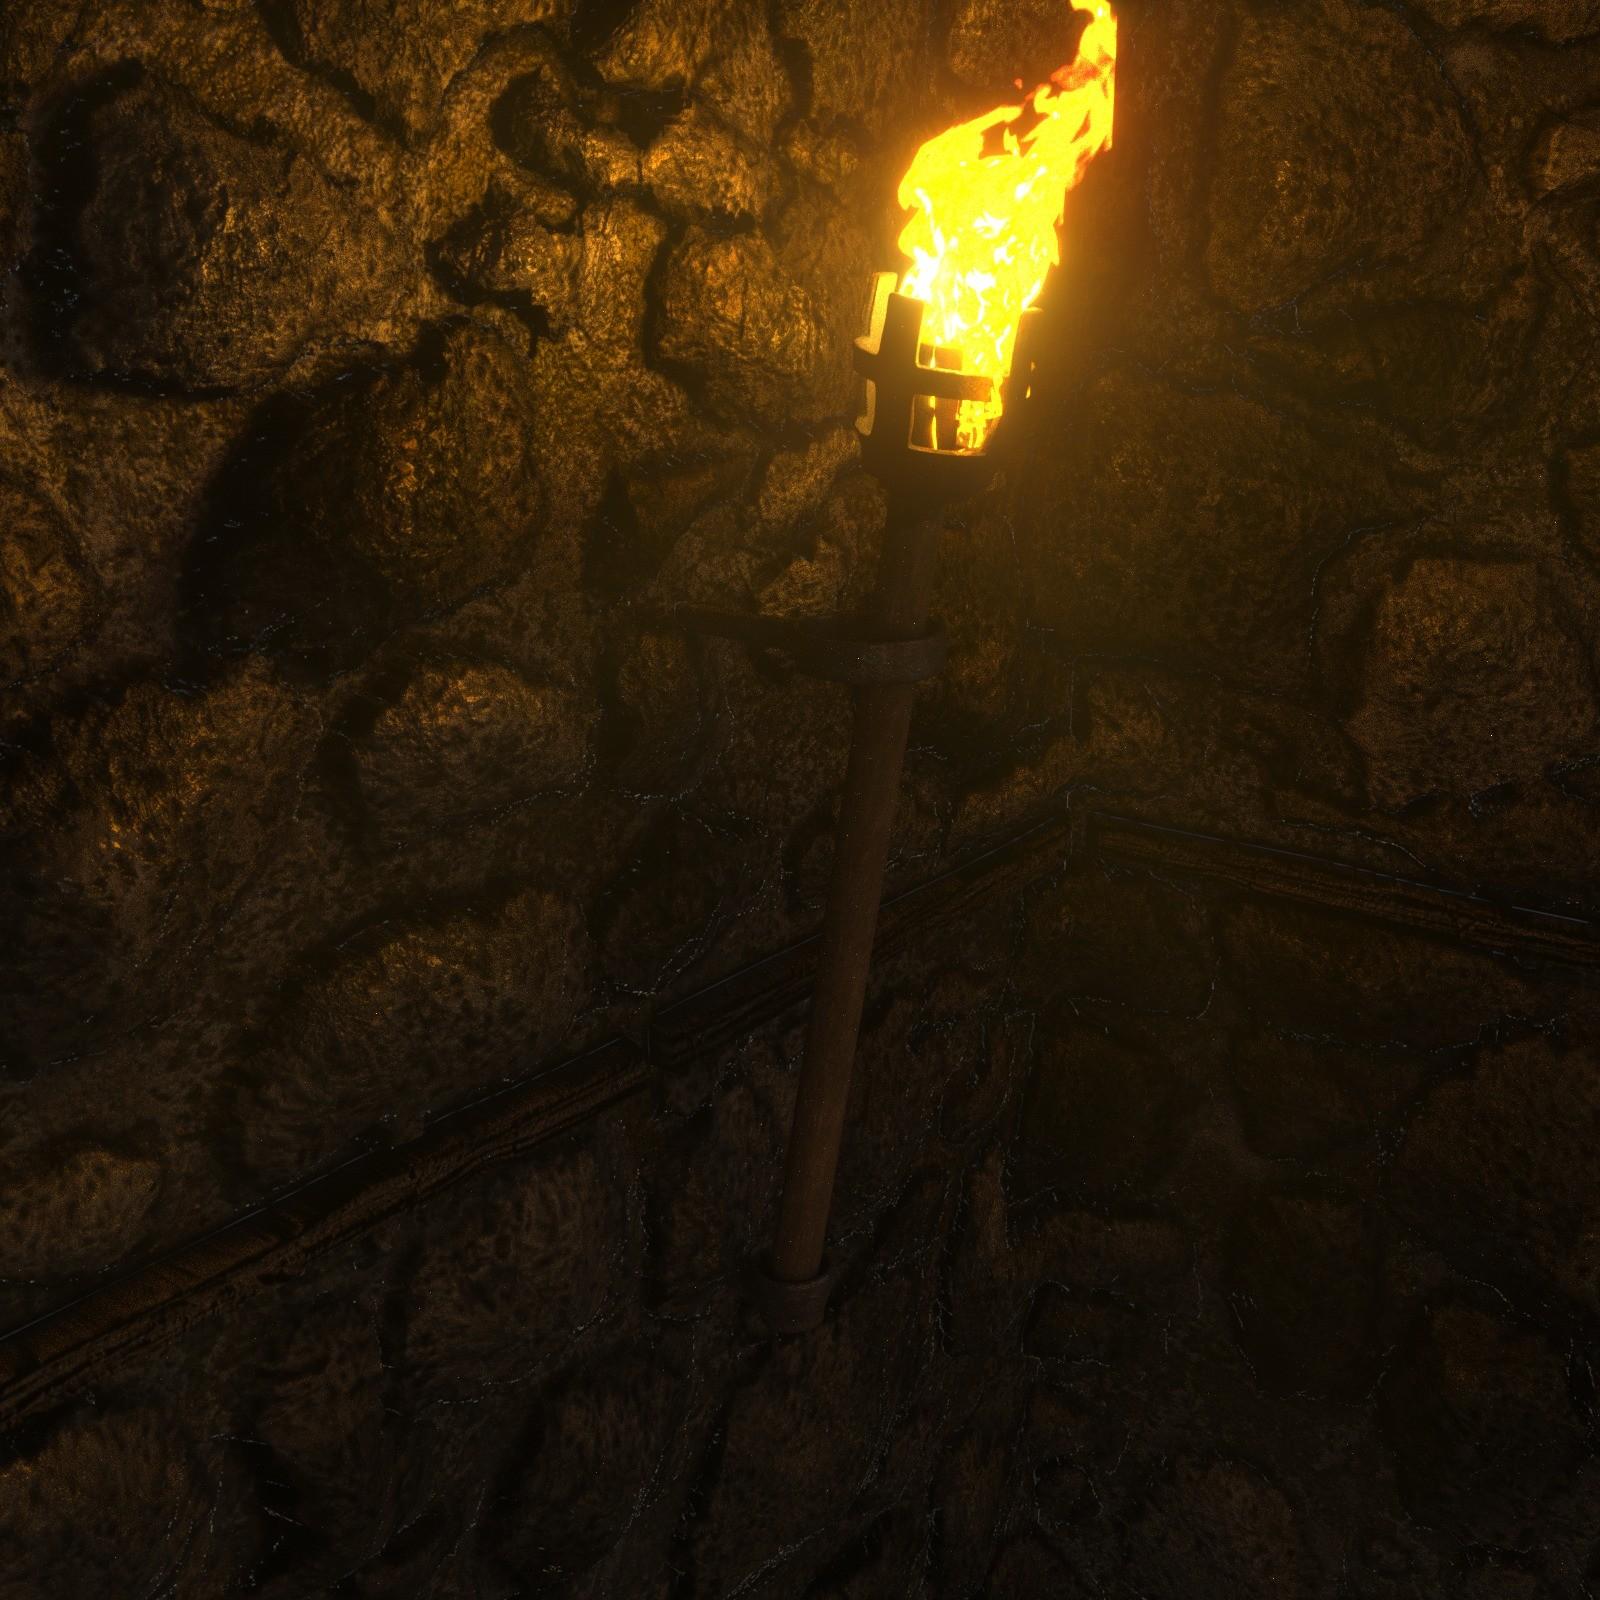 Cem tezcan torch 01 01